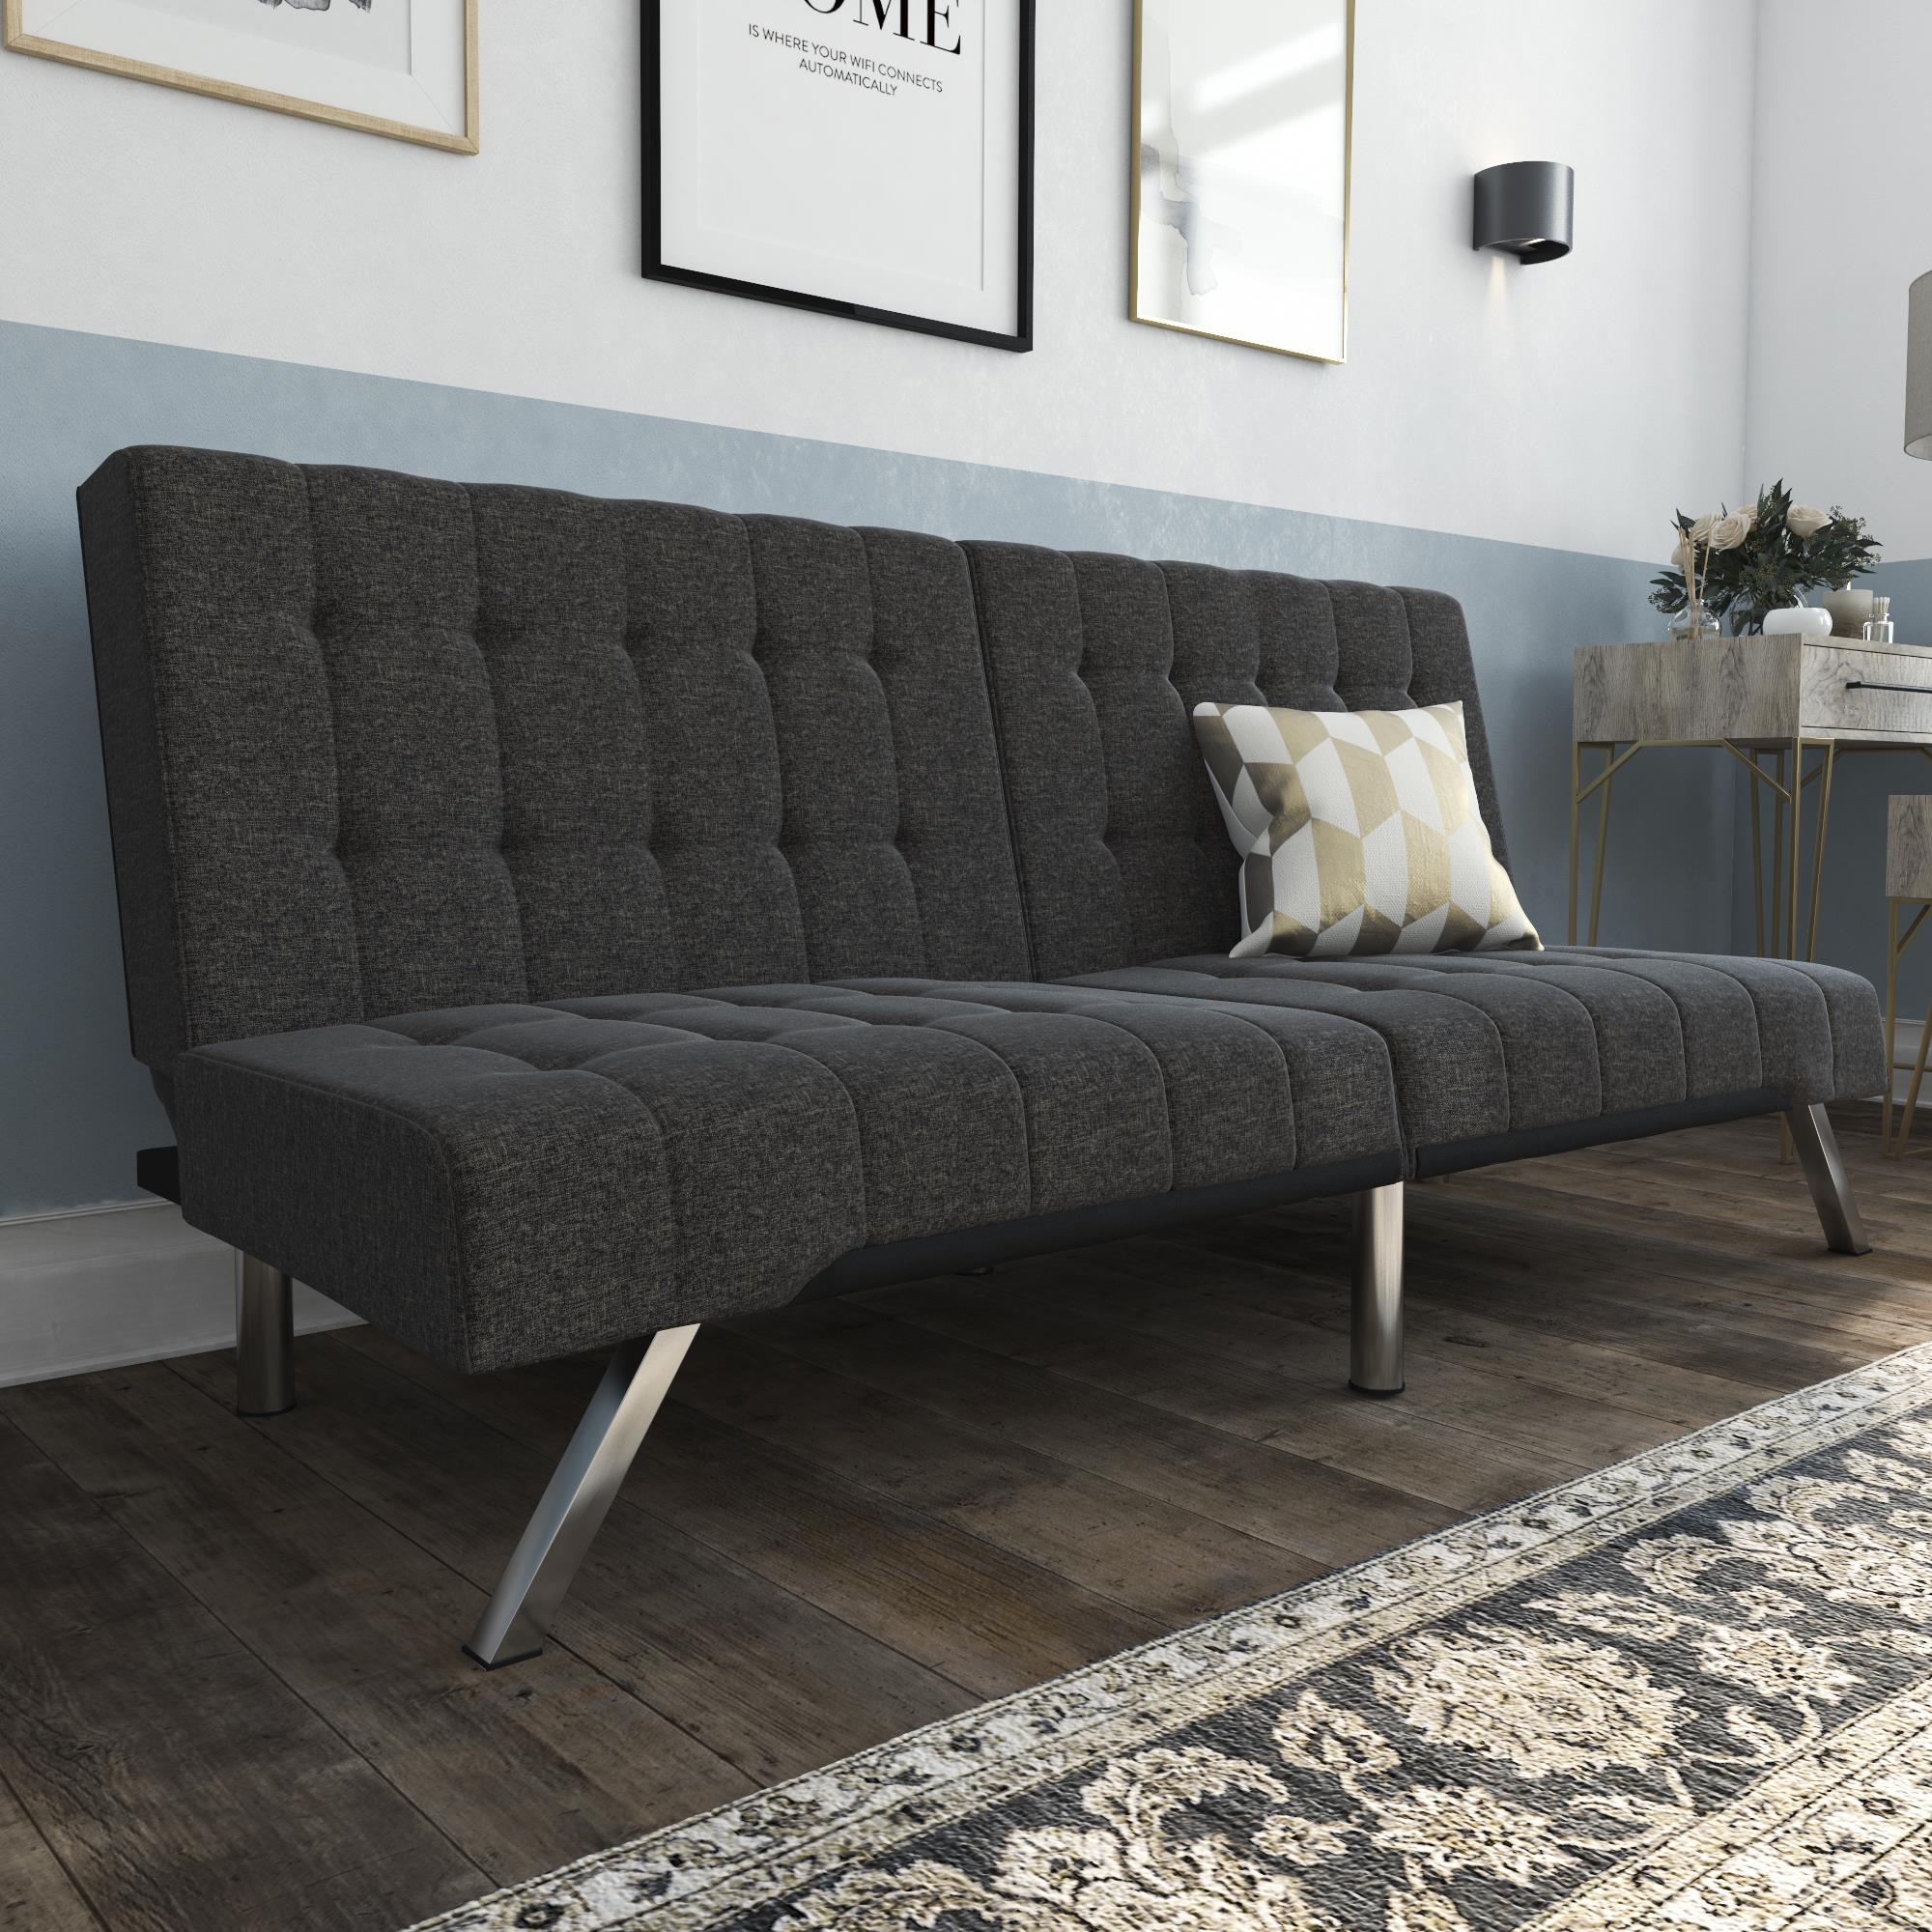 DHP Emily Convertible Futon Sofa Couch, Gray Linen $179.99+FS